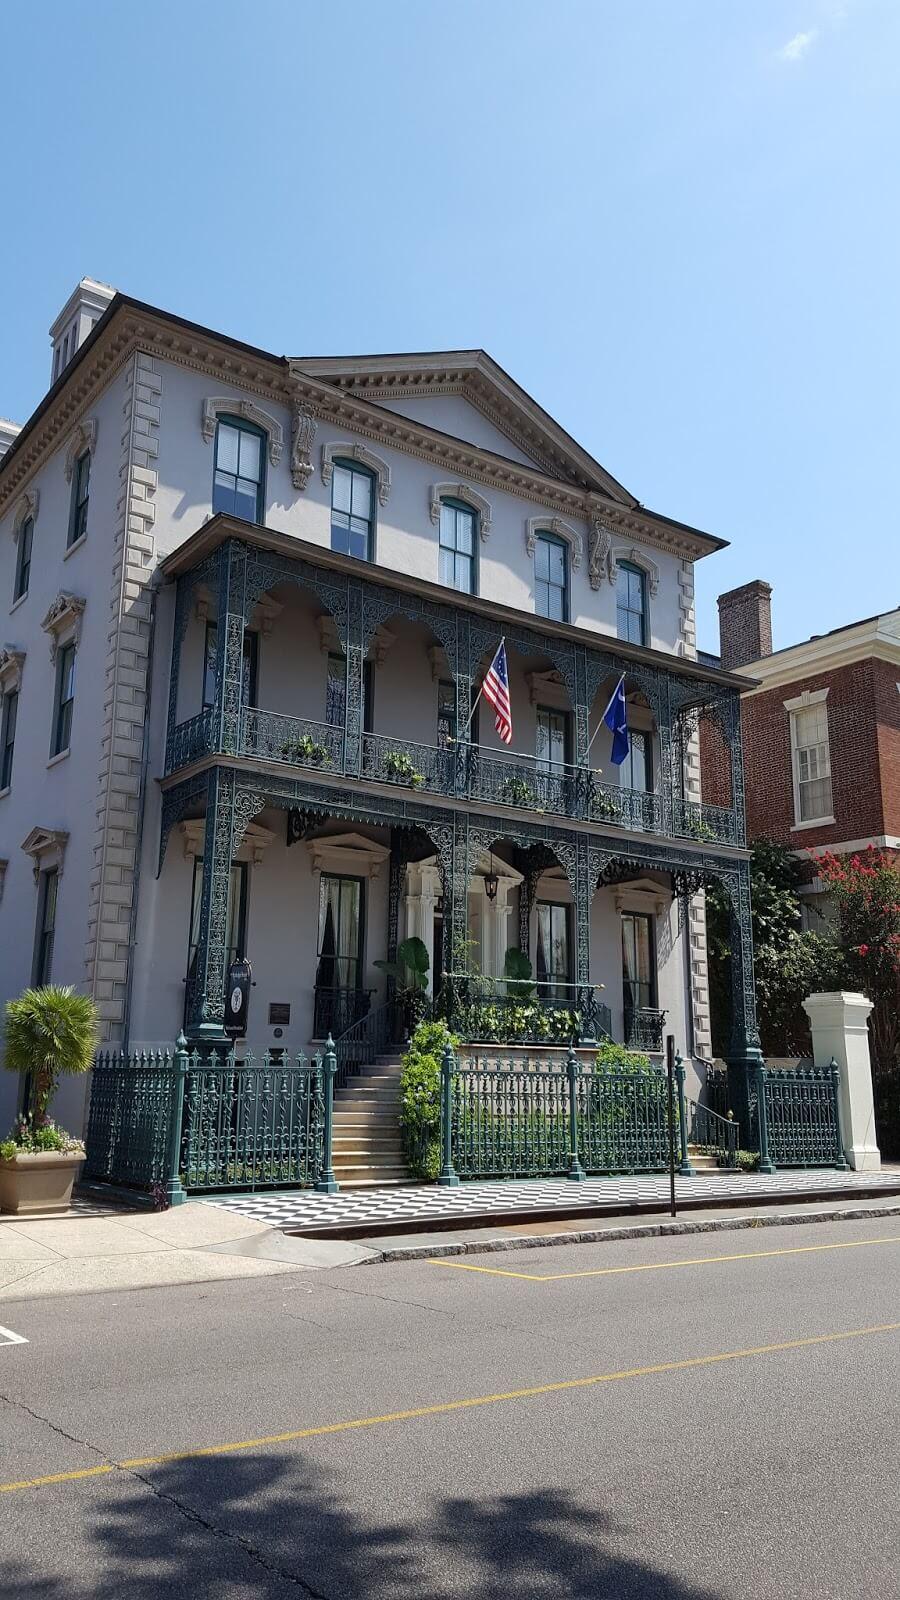 John Rutledge House Bed and Breakfast in Charleston - George Washington stayed here